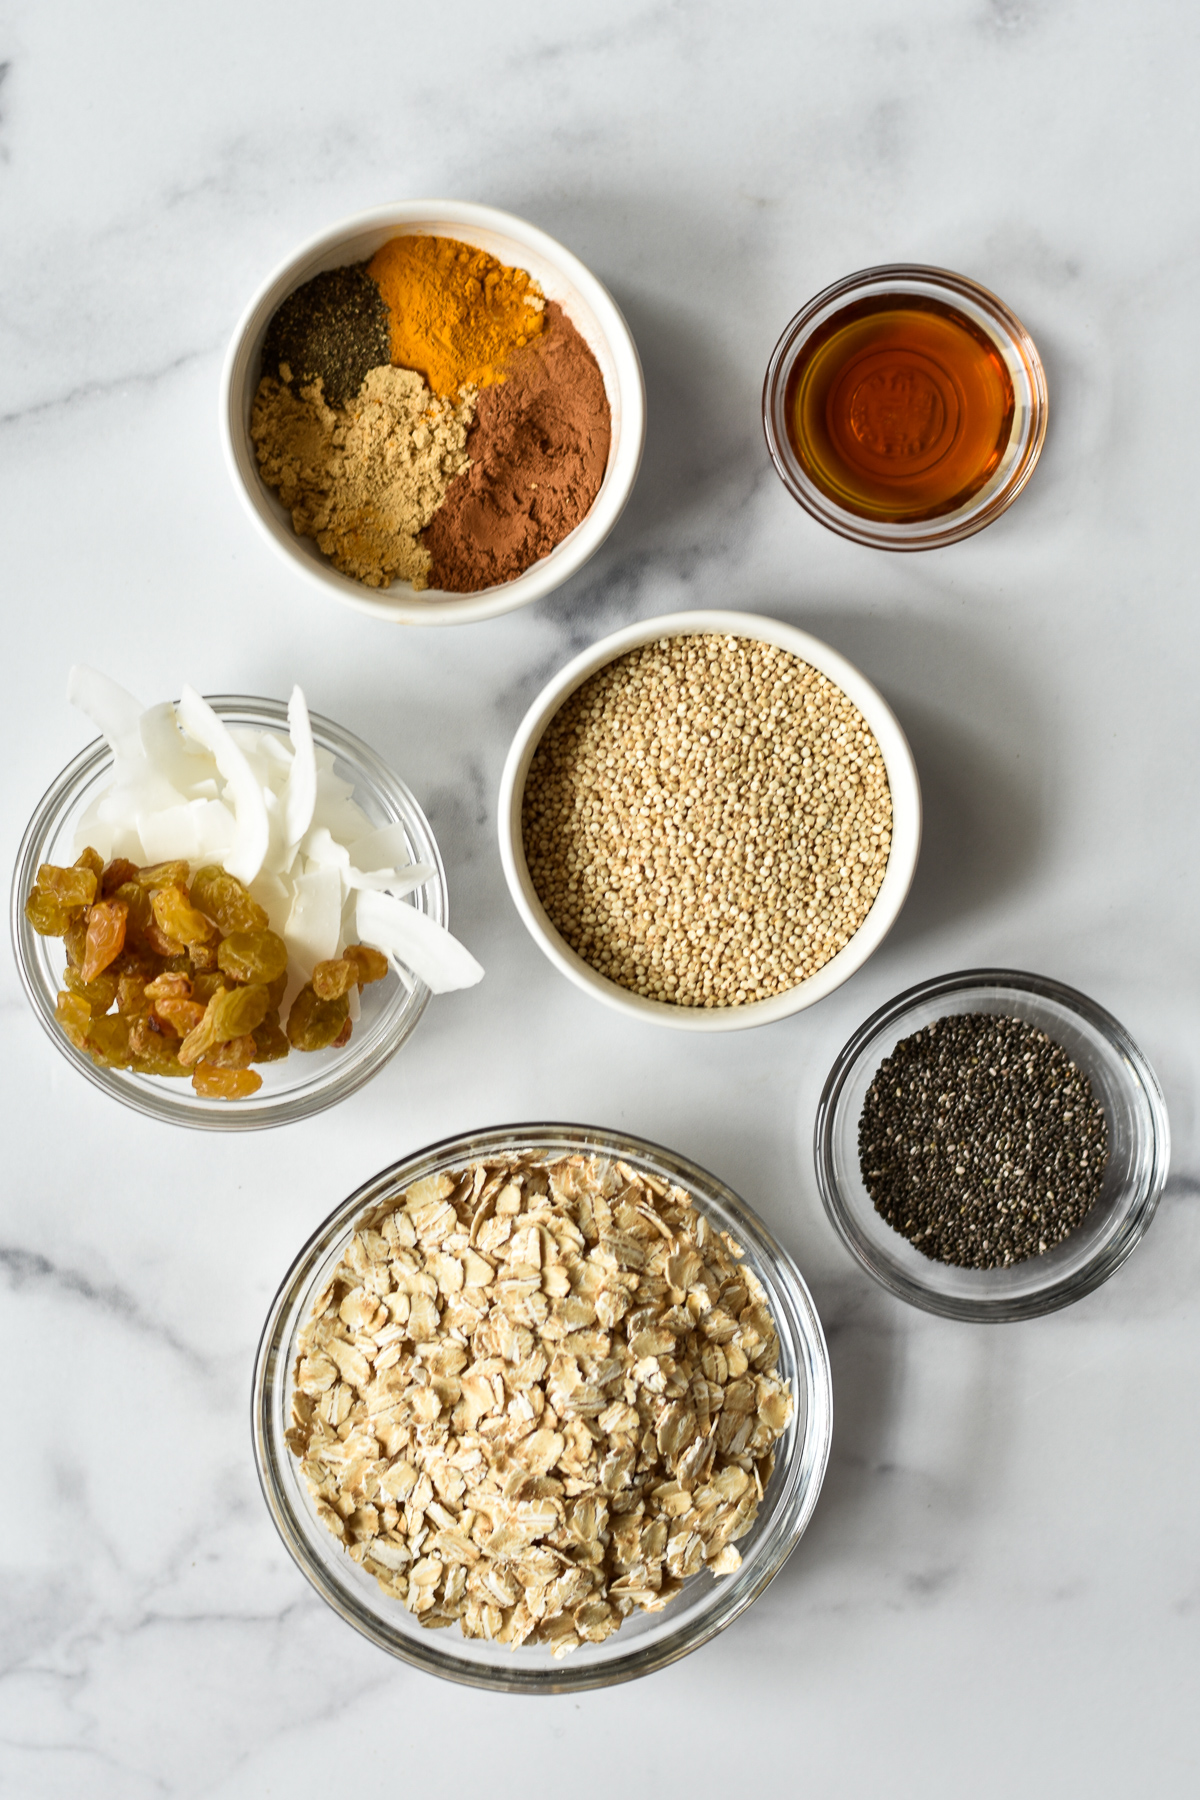 ingredients for turmeric black pepper granola